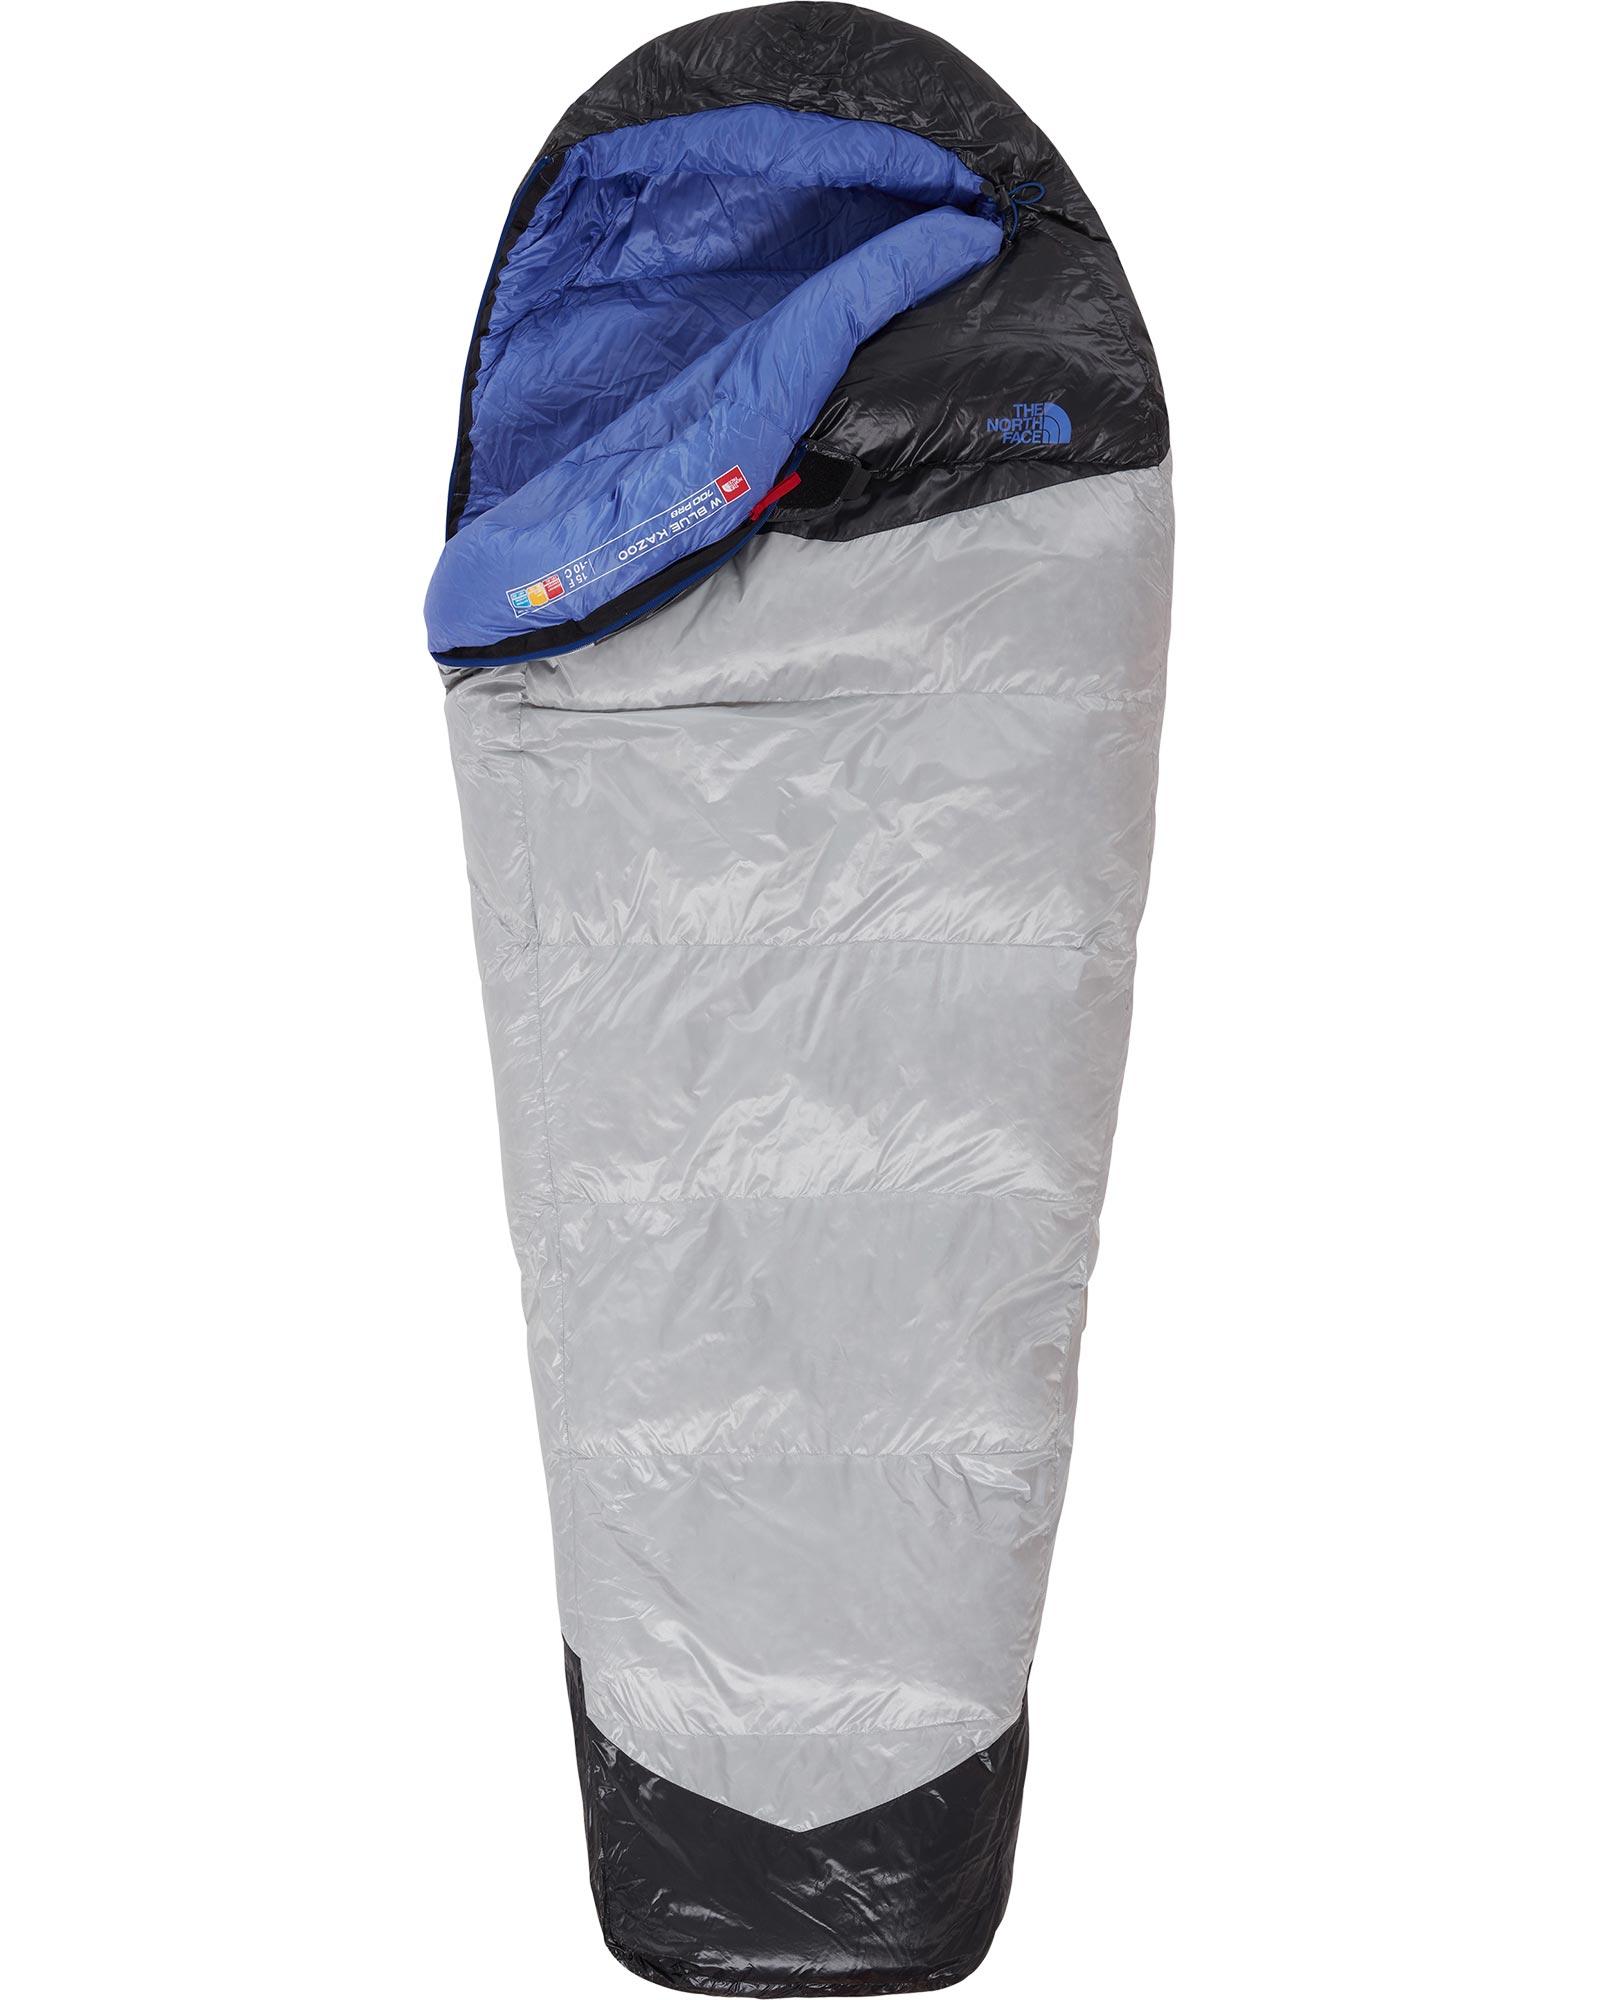 The North Face Blue Kazoo Women's Regular Sleeping Bag 0